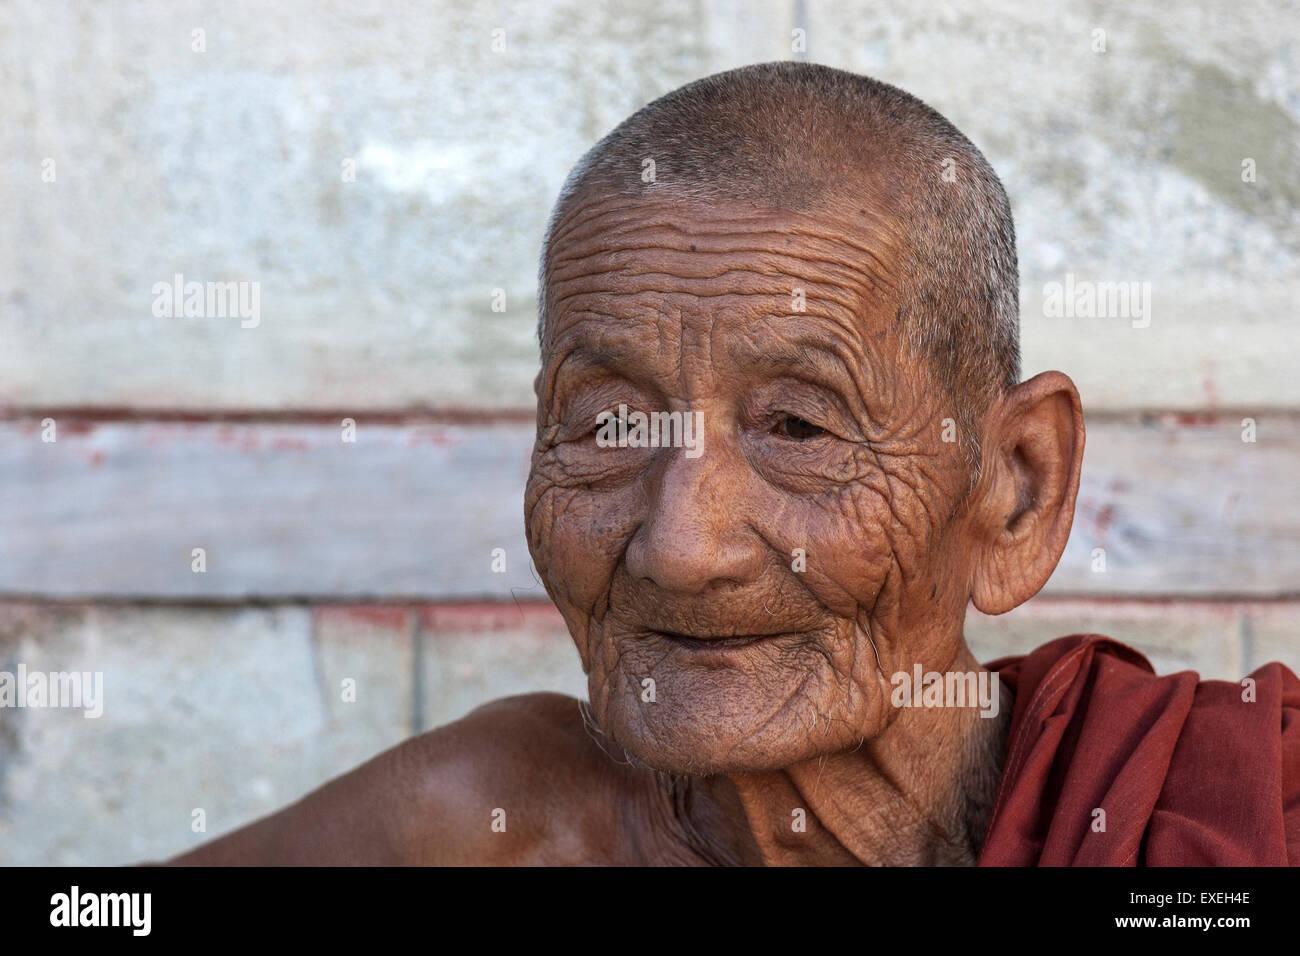 Old monk, portrait, Shwe Yan Bye Monastery, near Nyaungshwe, Inle Lake, Shan State, Myanmar - Stock Image